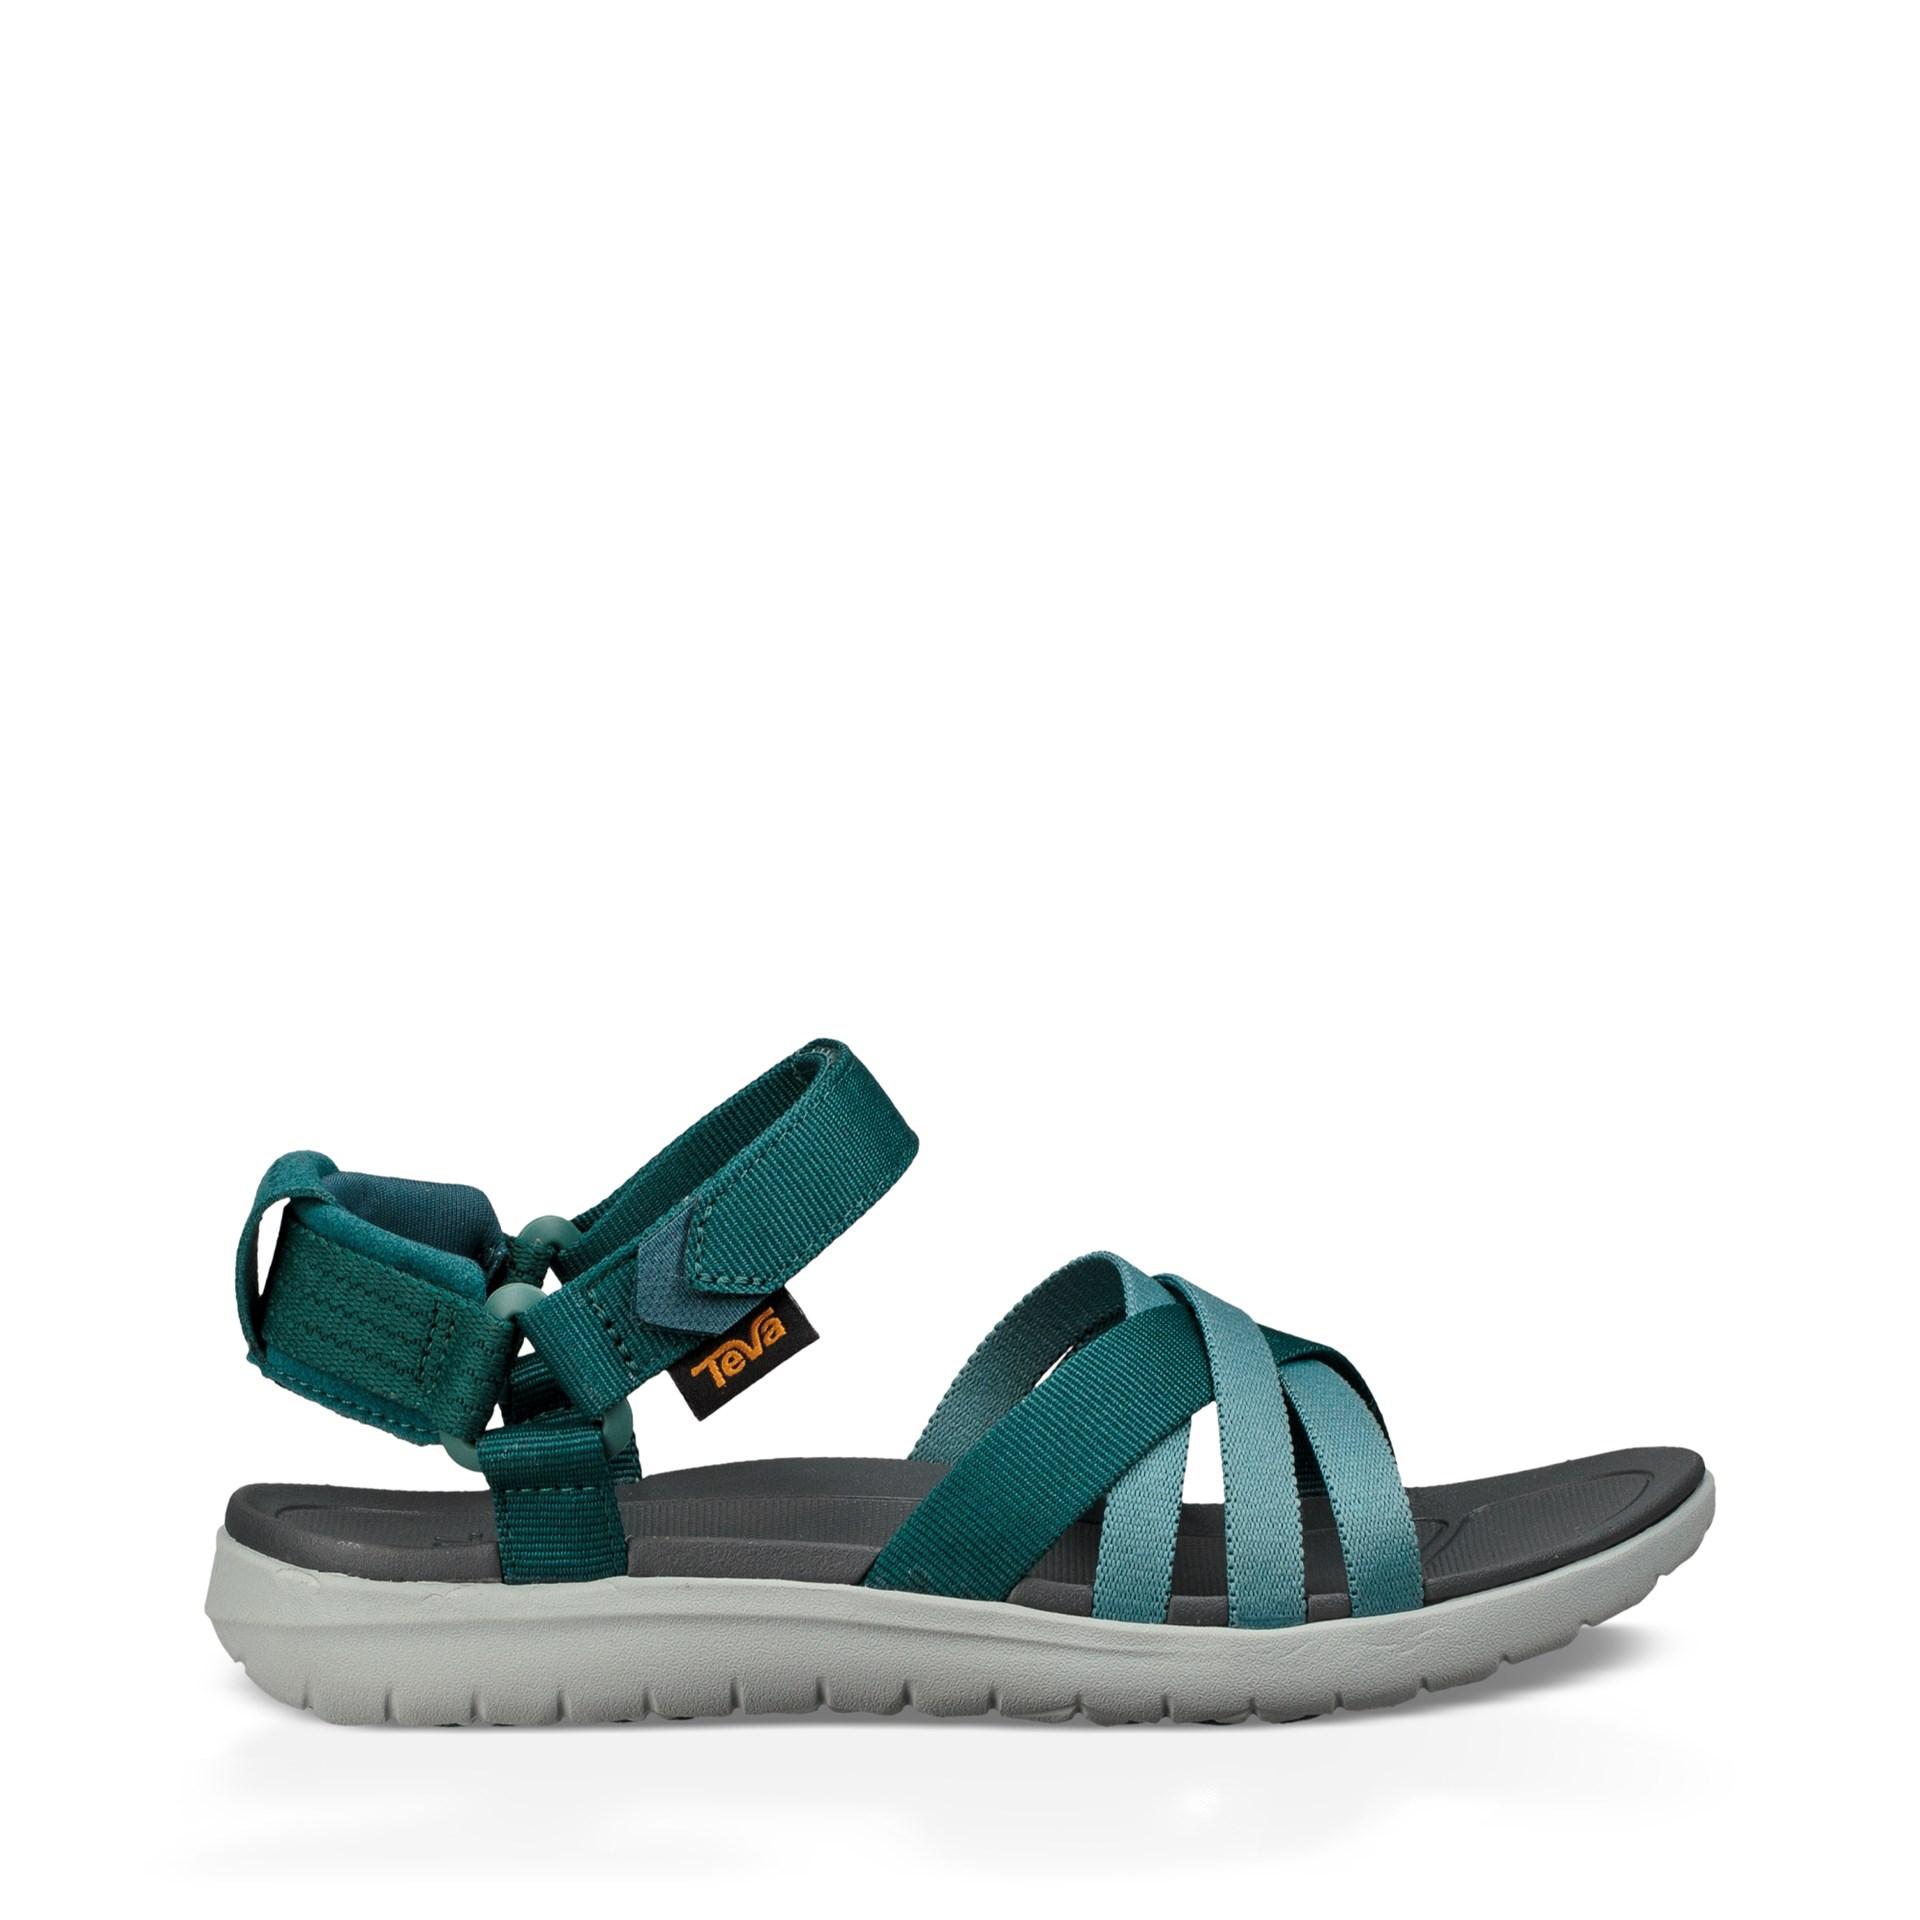 Braasport Teva Sanborn Sandal Dame